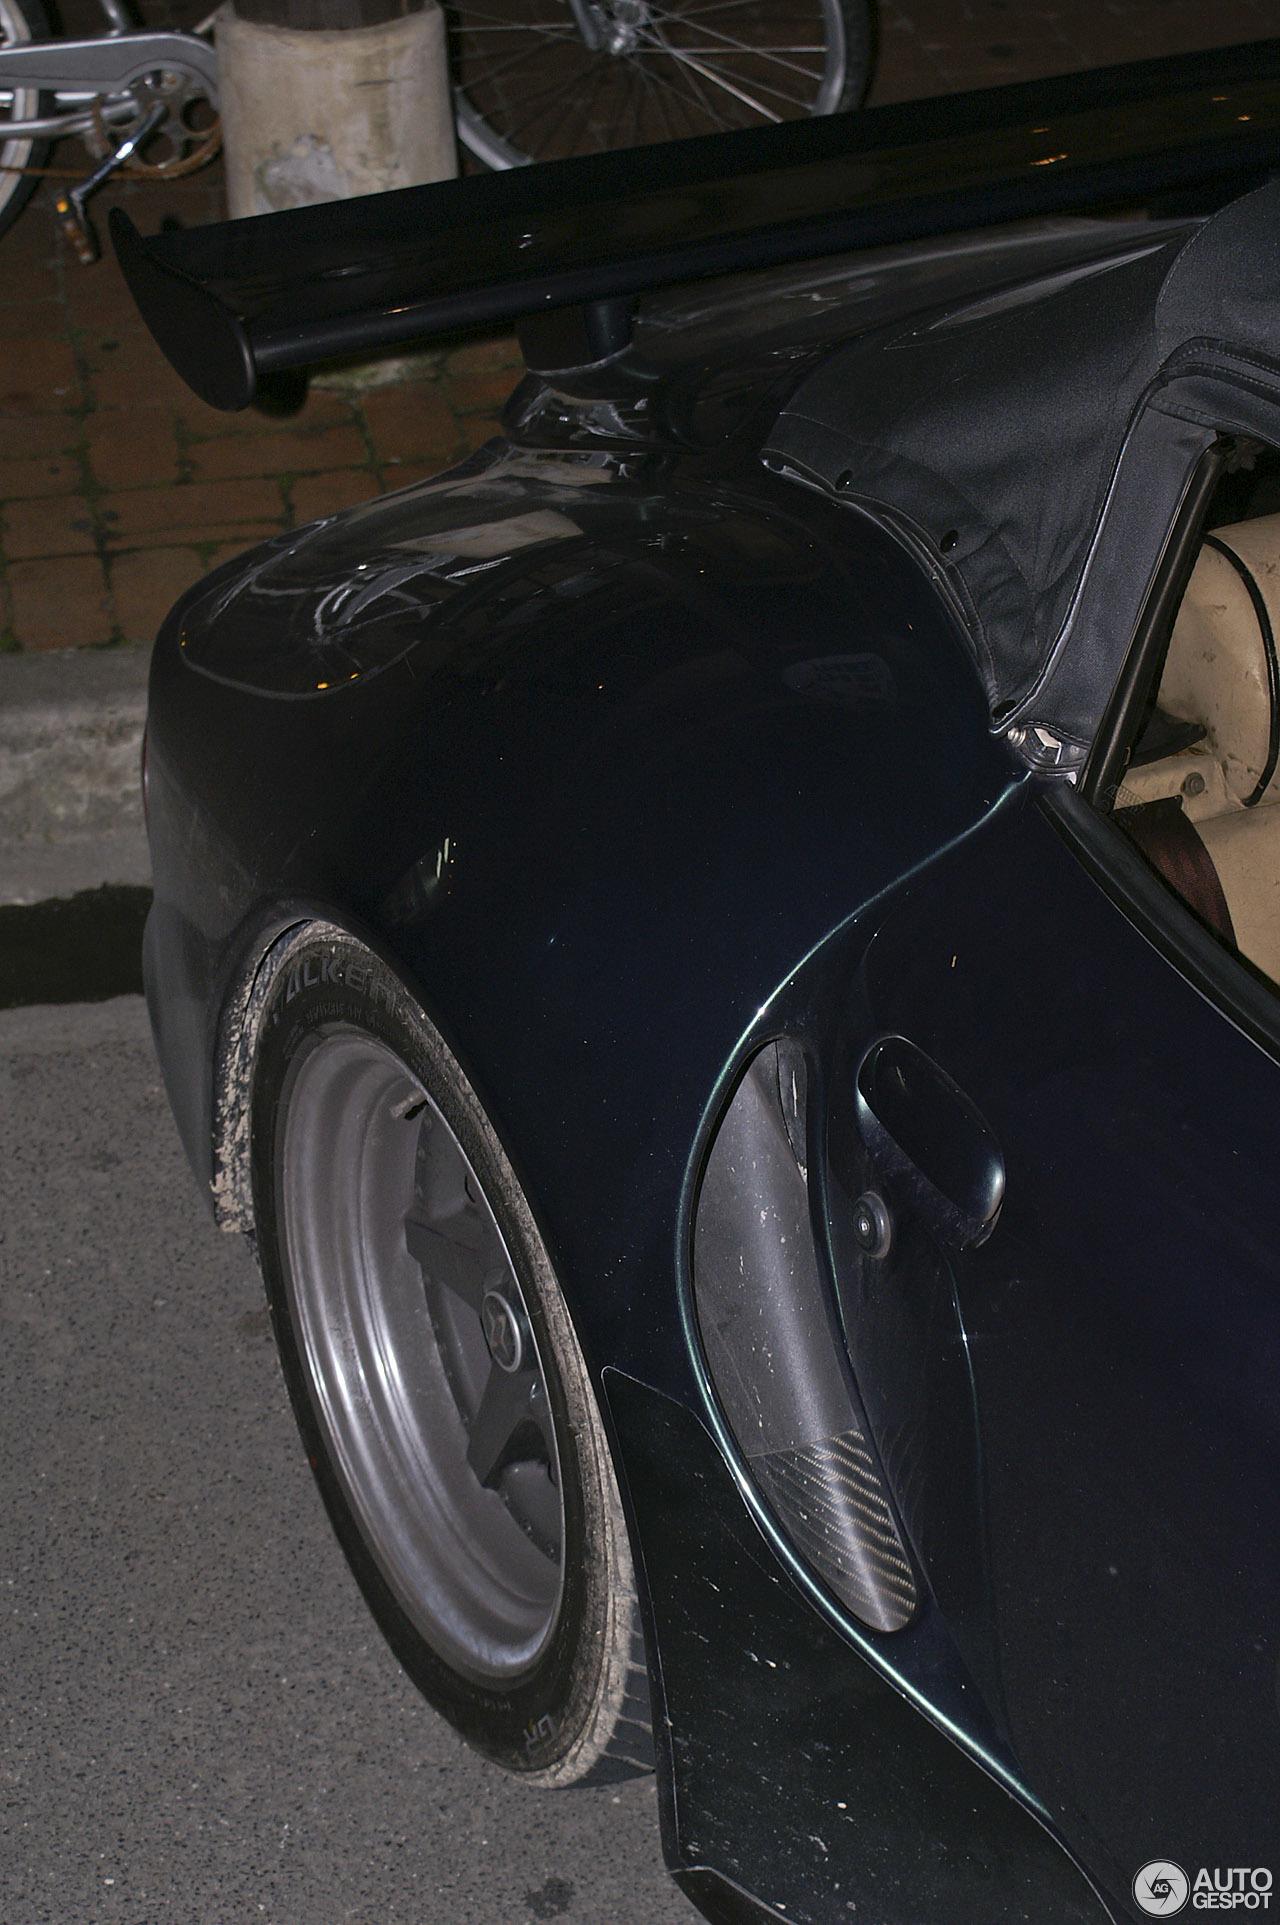 marcos mantara spyder lm500 9 september 2014 autogespot